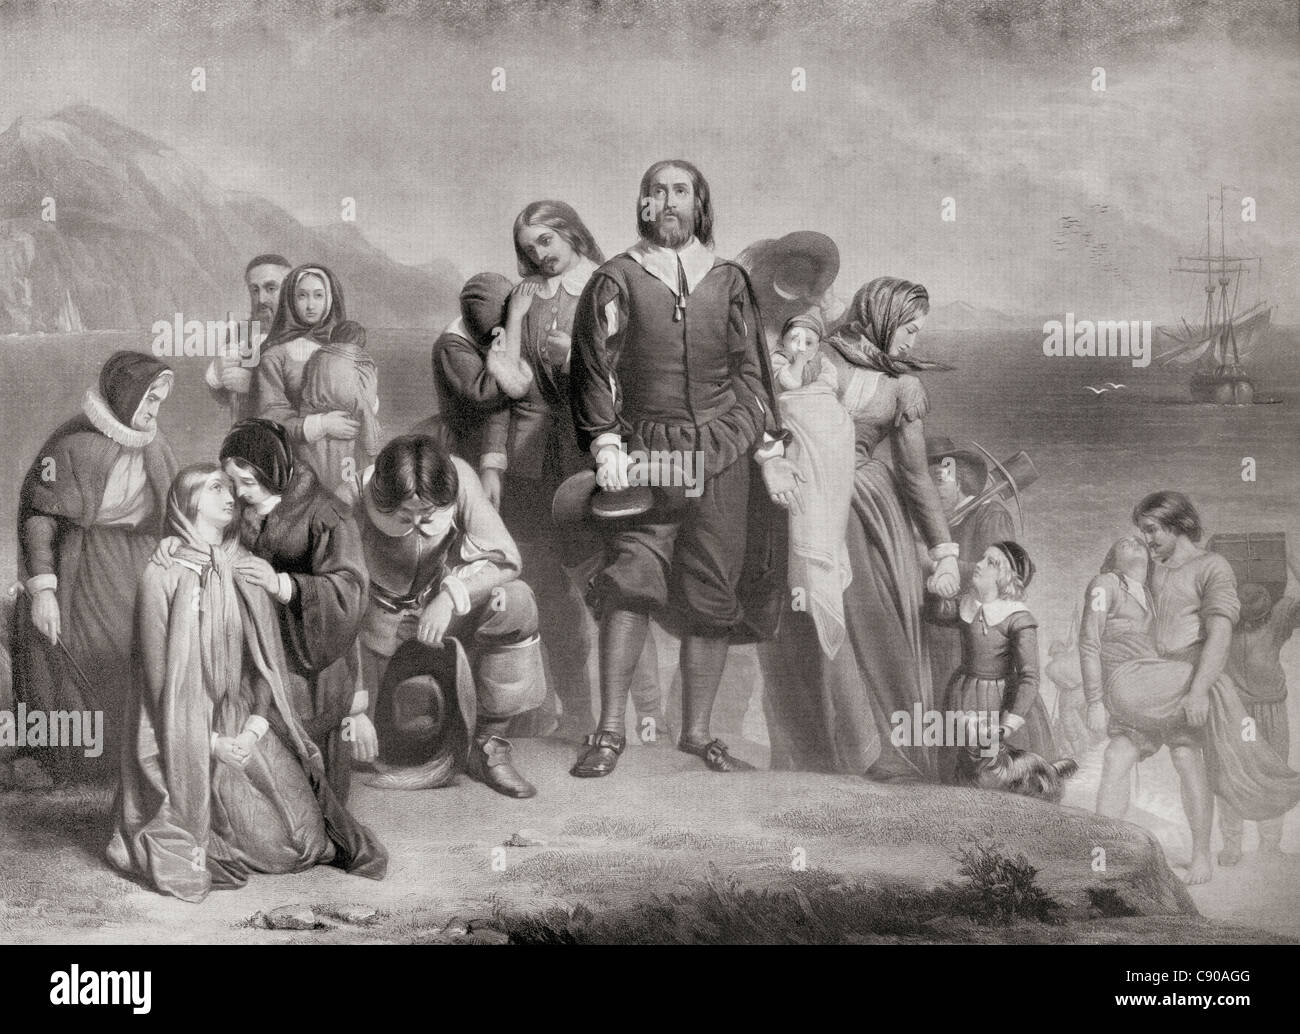 Die Landung der Pilgerväter, Plymouth, Massachusetts, Nordamerika auf 21. Dezember 1620. Stockbild